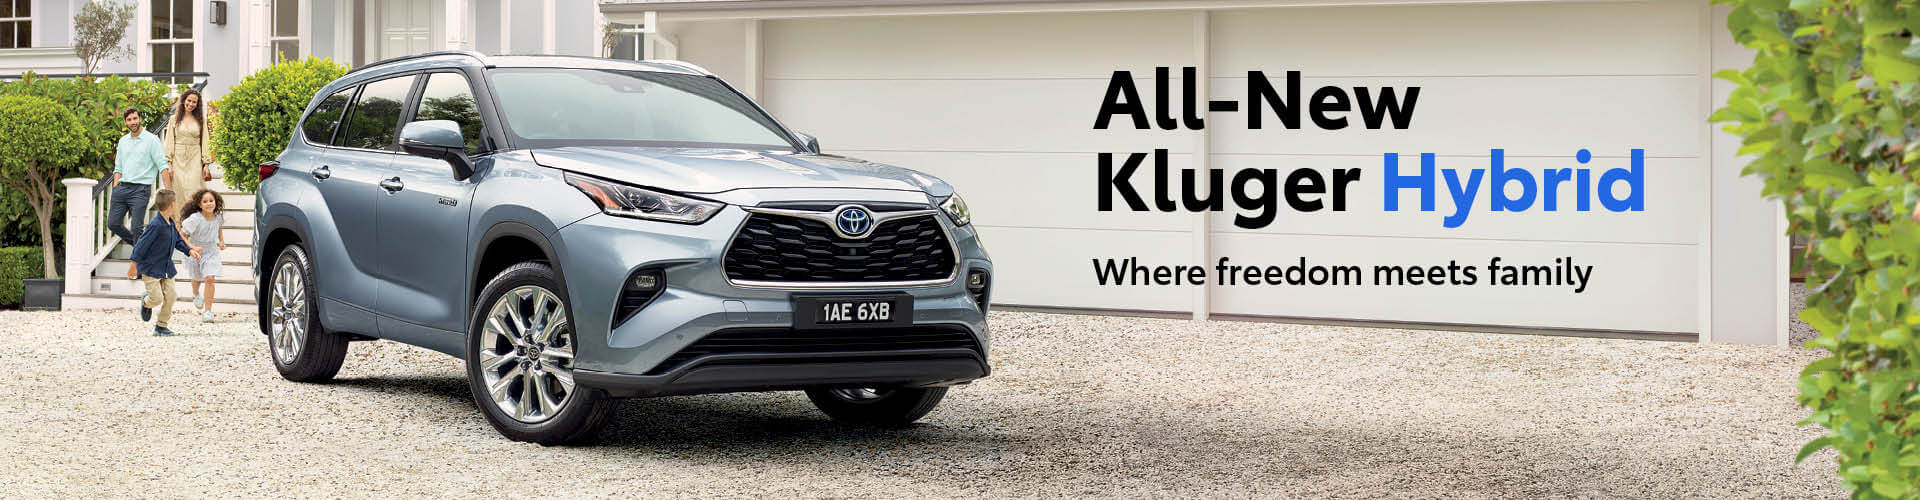 Toyota All-New Kluger Hybrid